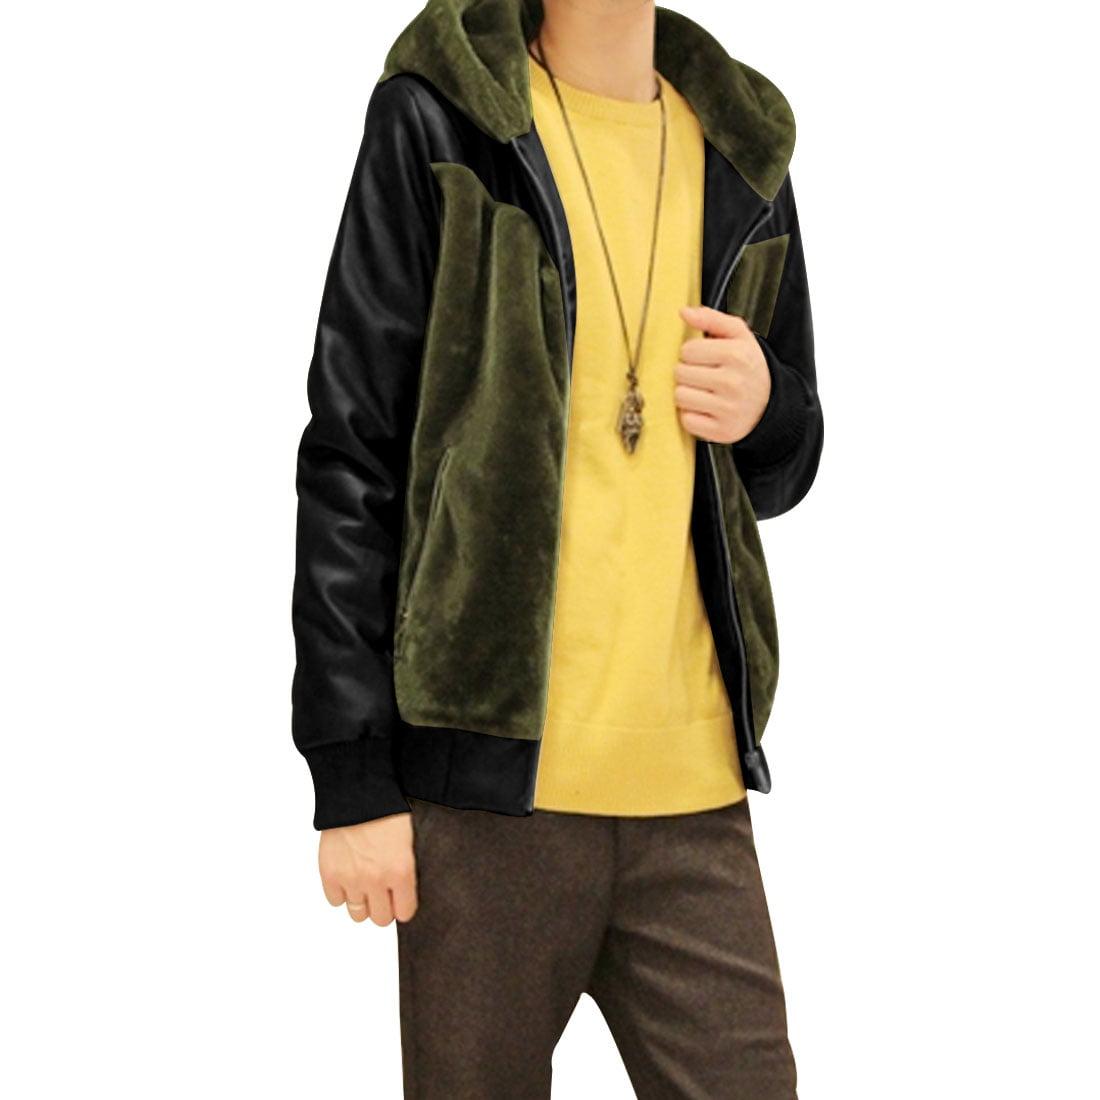 Man Korean Style Trendy Faux Leather Panel Jacket Dark Gr...